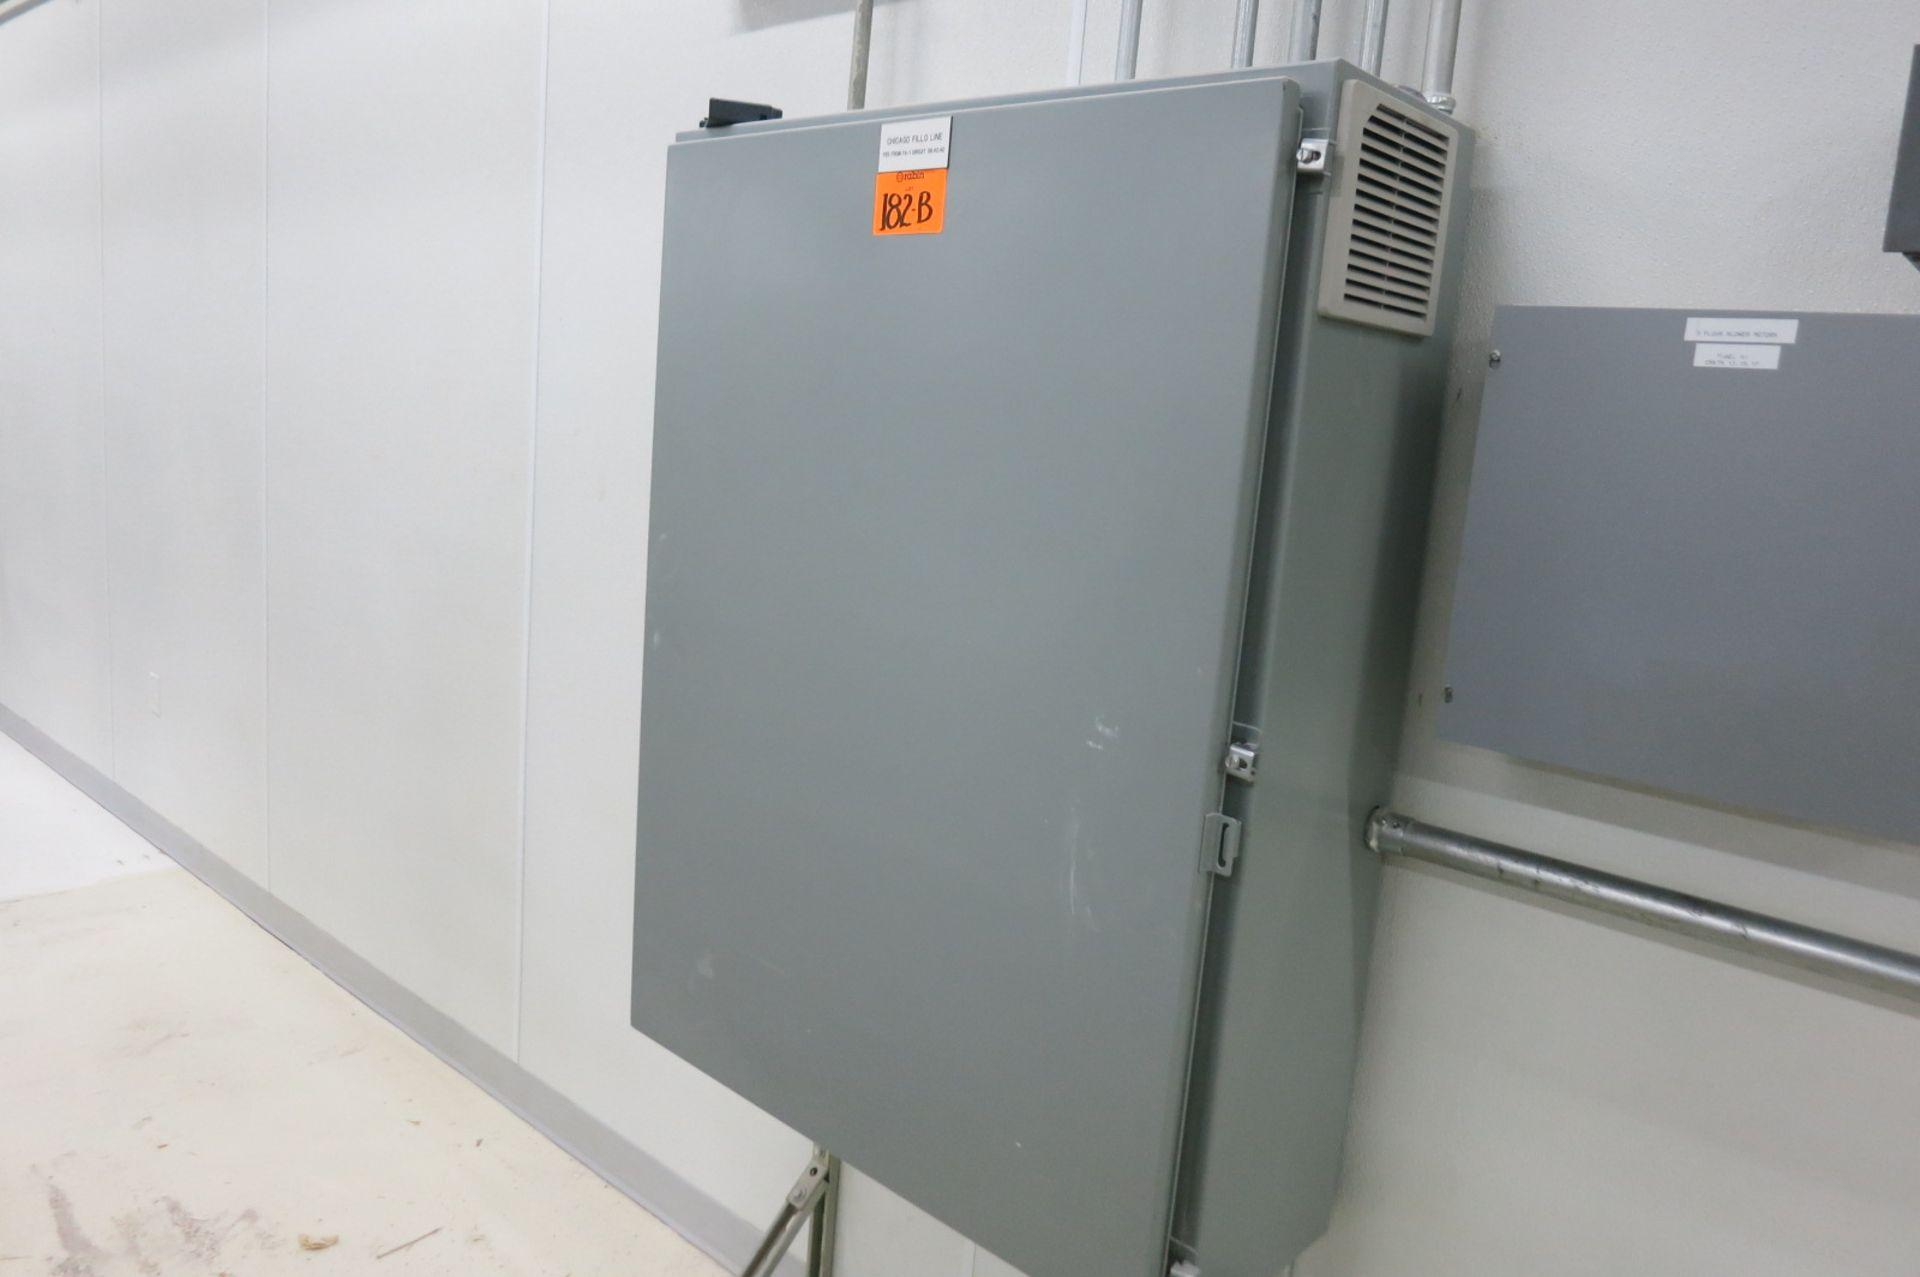 Lot 182B - Drive Control Panel (Extruder B)